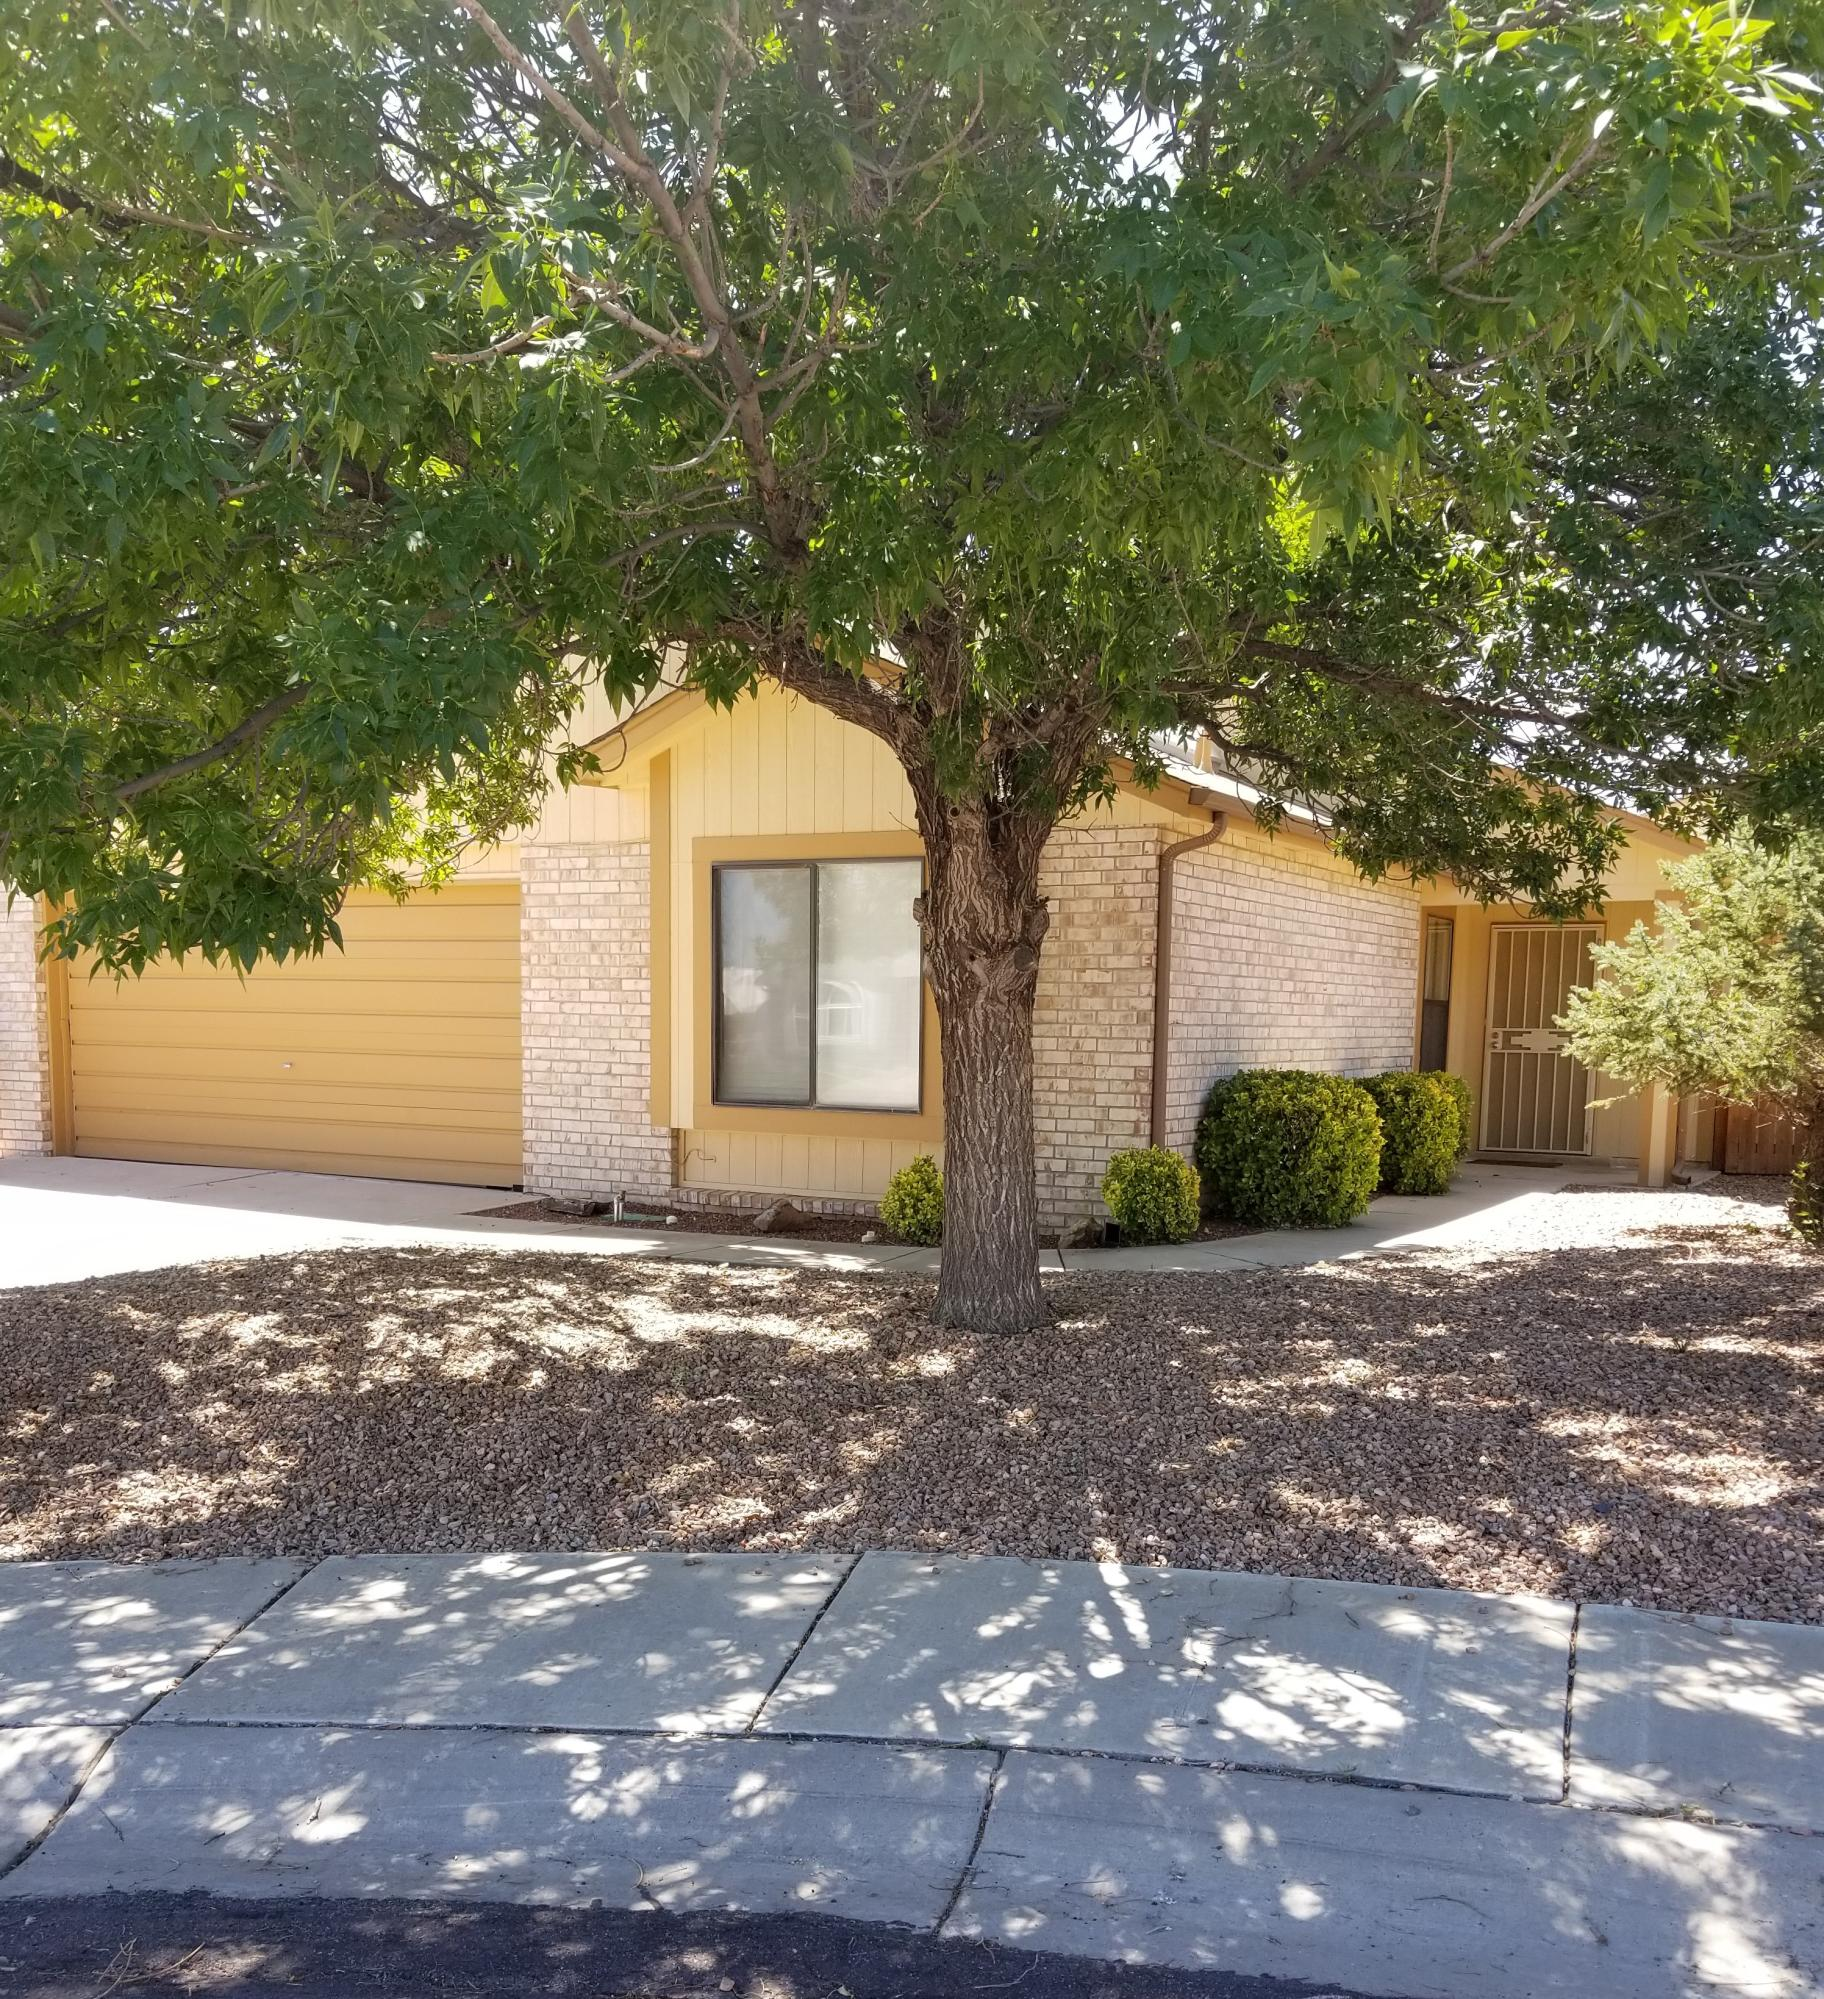 7704 SANTA CATARINA Court NW Property Photo - Albuquerque, NM real estate listing